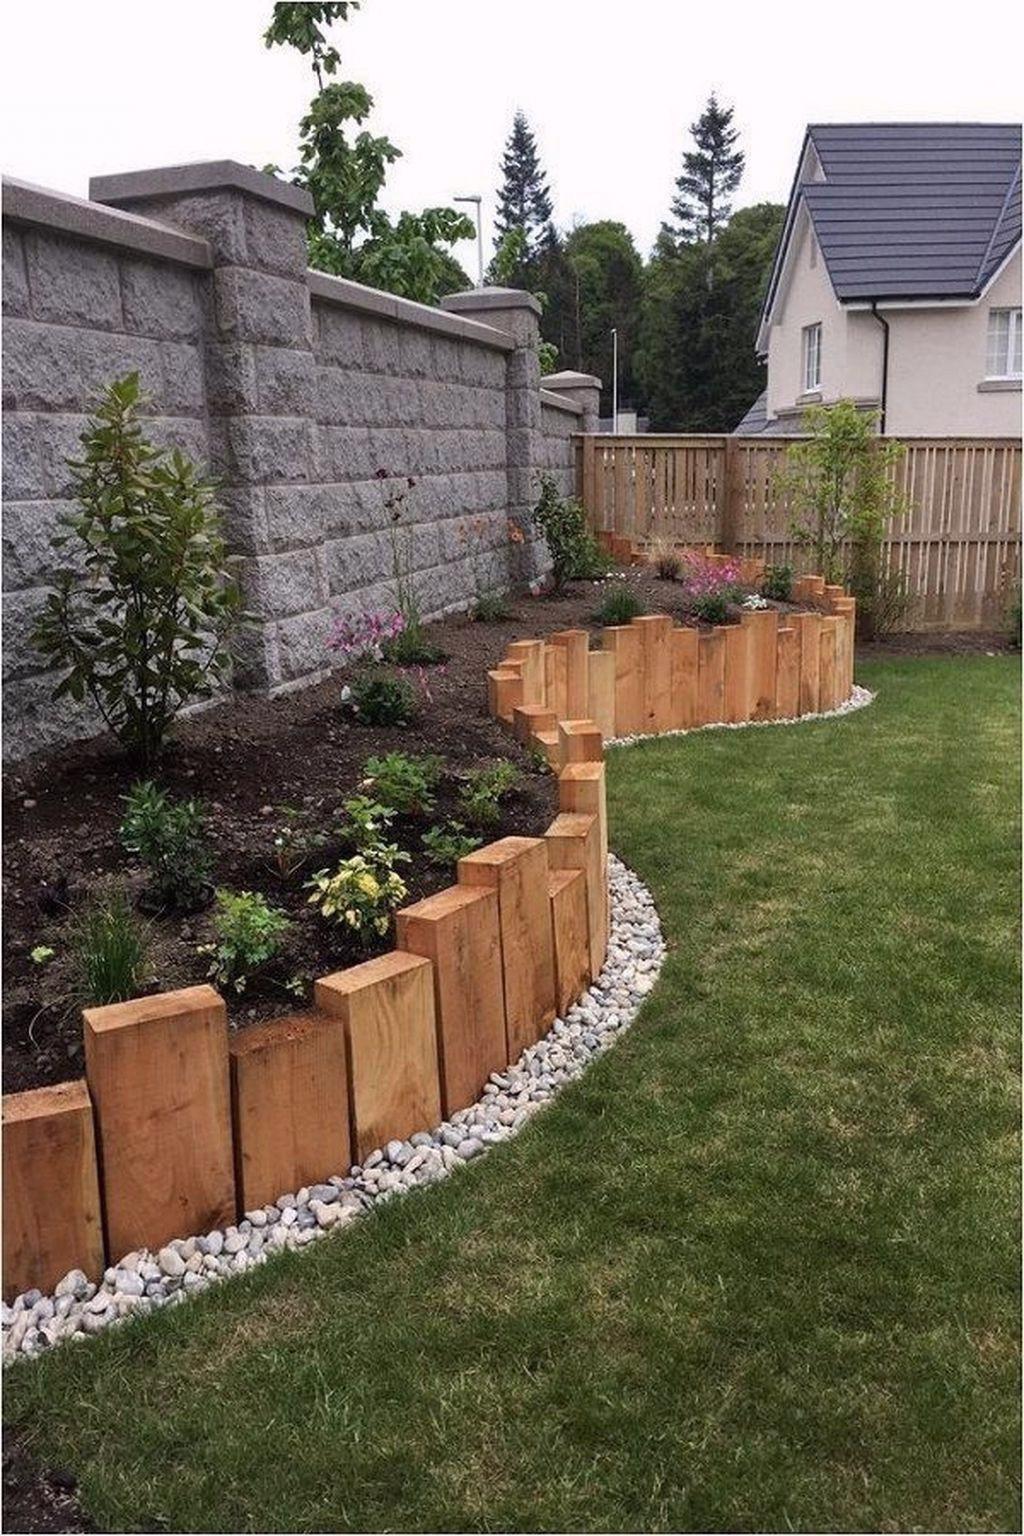 49 Beautiful Backyard Landscaping Design Ideas On A Budget Beautiful Look 43 - Best Home Desi...